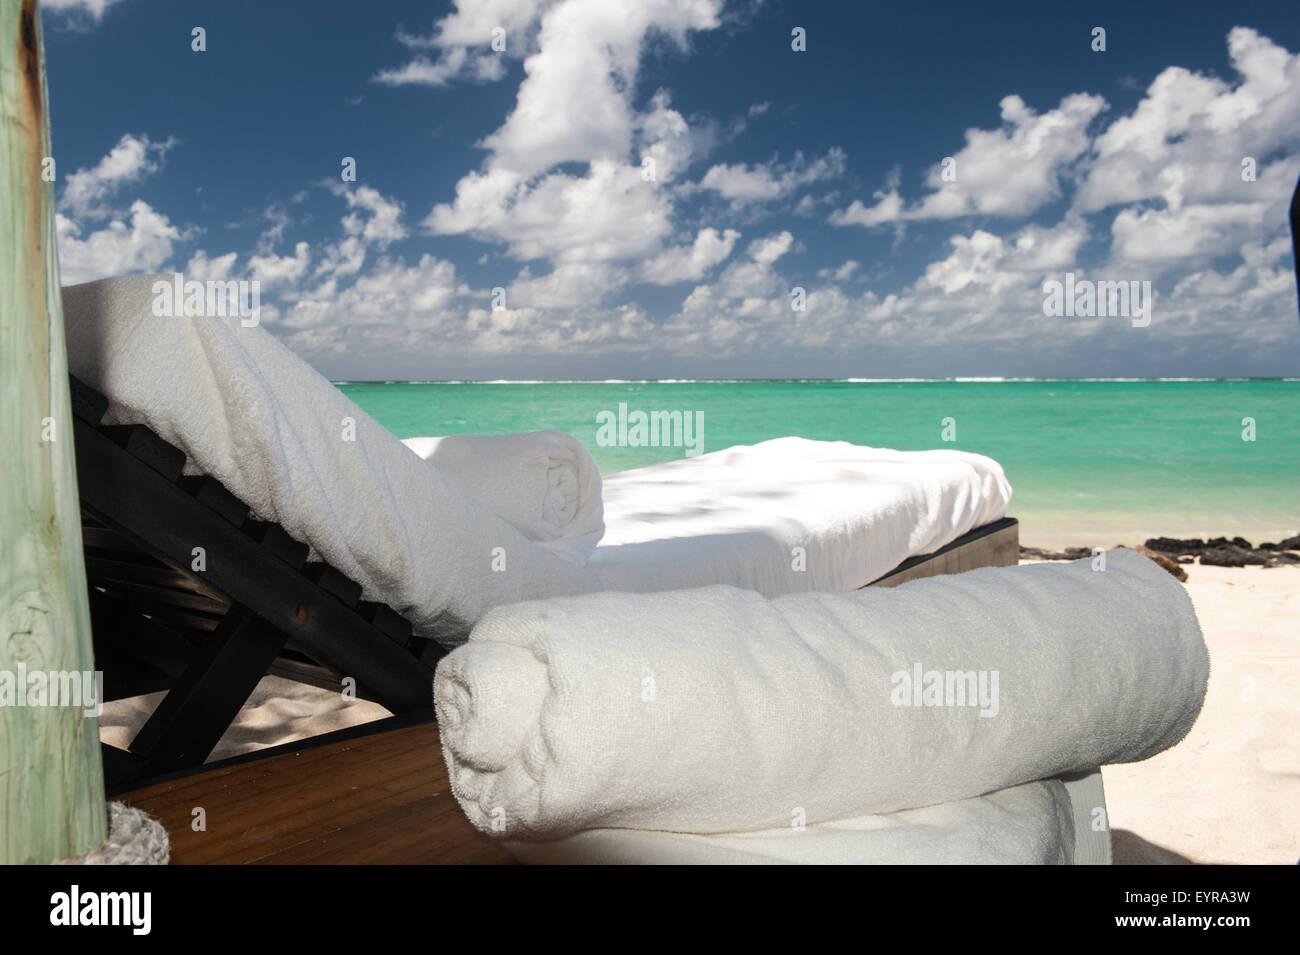 Ile au Cerfs, Mauritius. White towels on sun lounger with a tourquoise sea. - Stock Image